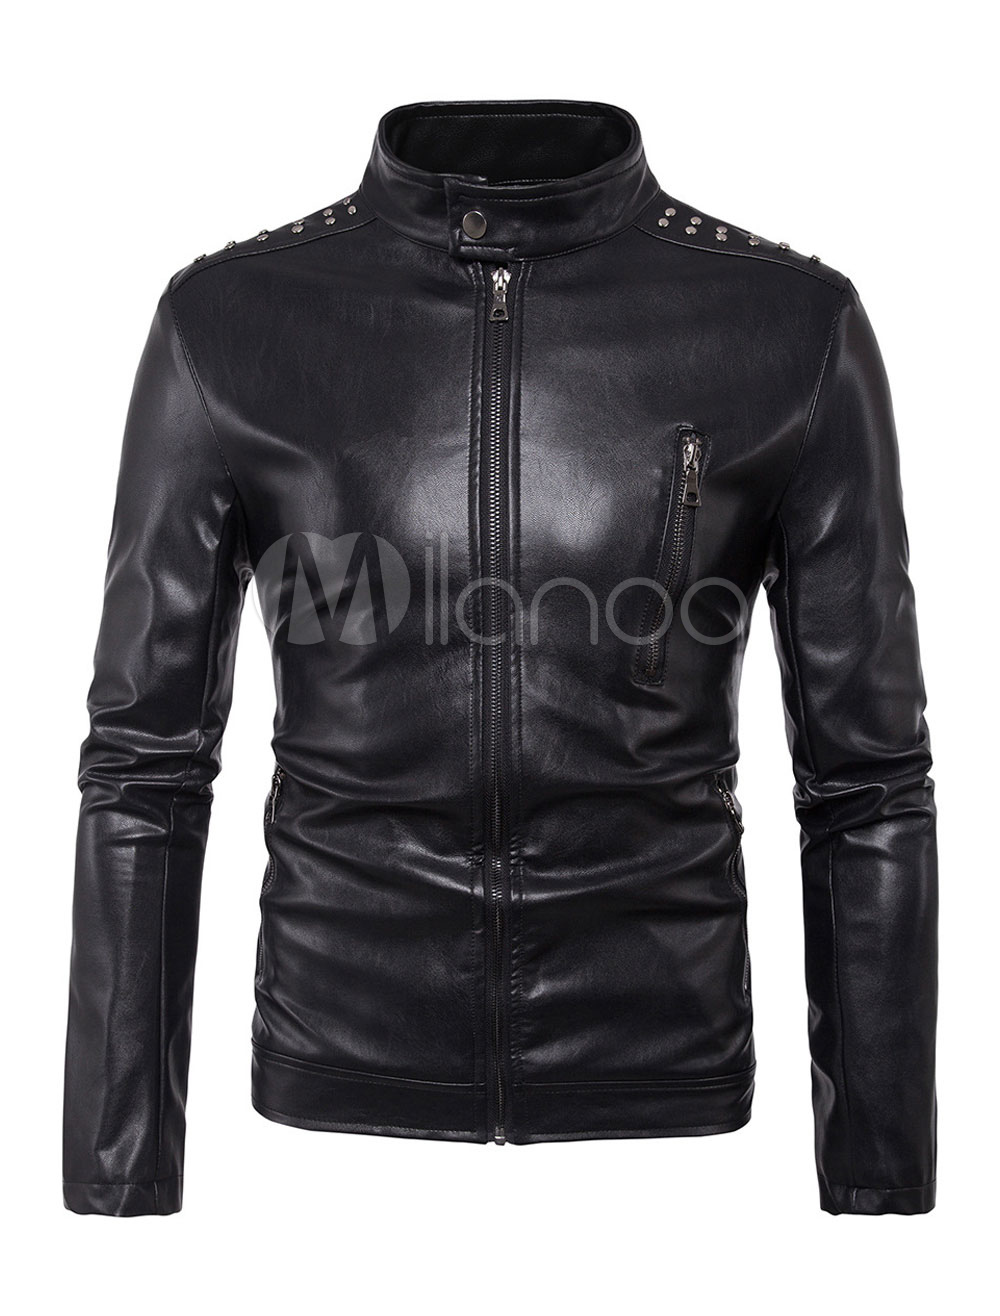 Black Motorcycle Jacket Men Leather Jacket Stand Collar Long Sleeve Zip Up Short Jacket thumbnail